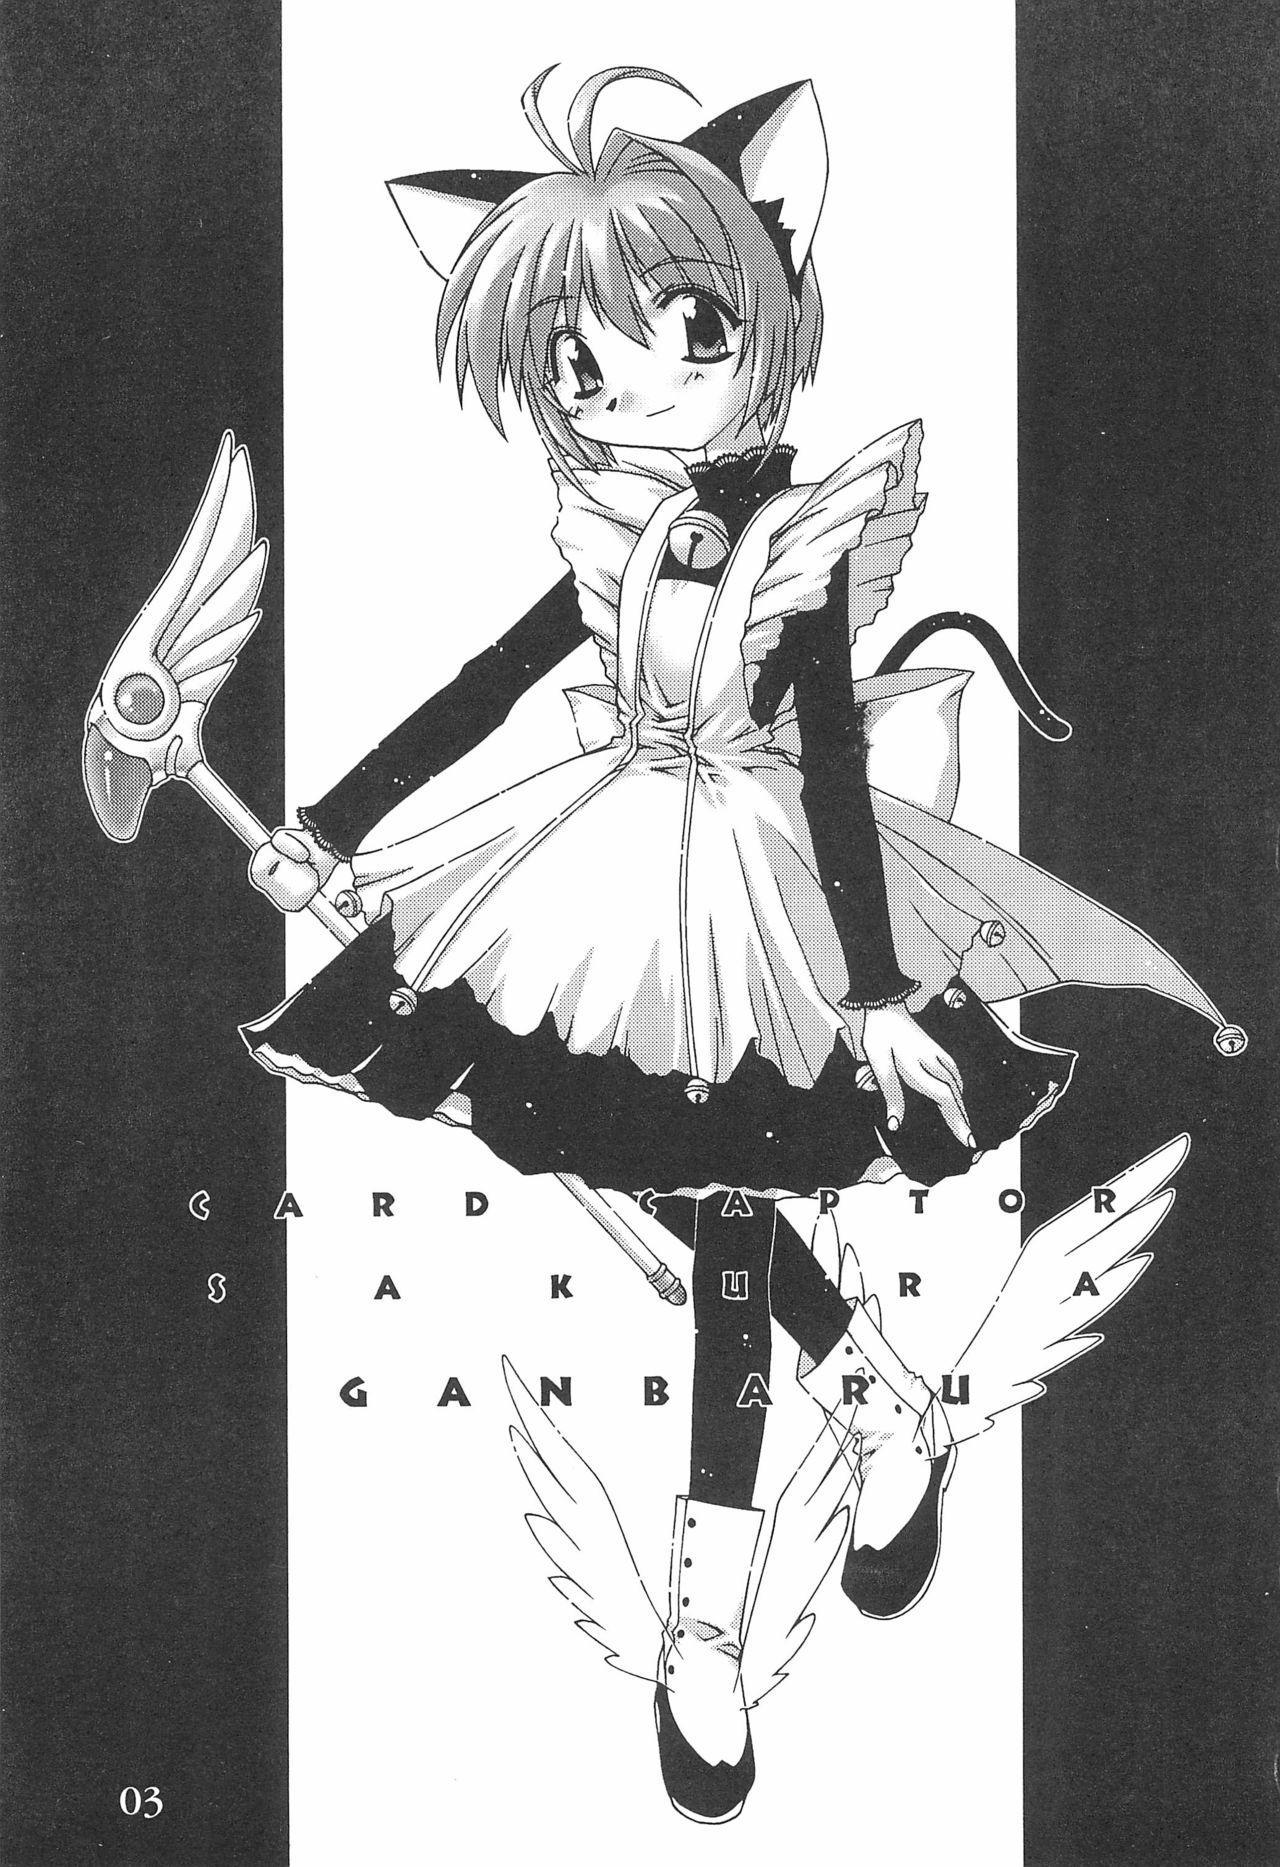 Card Captor Sakura Ganbaru! 2